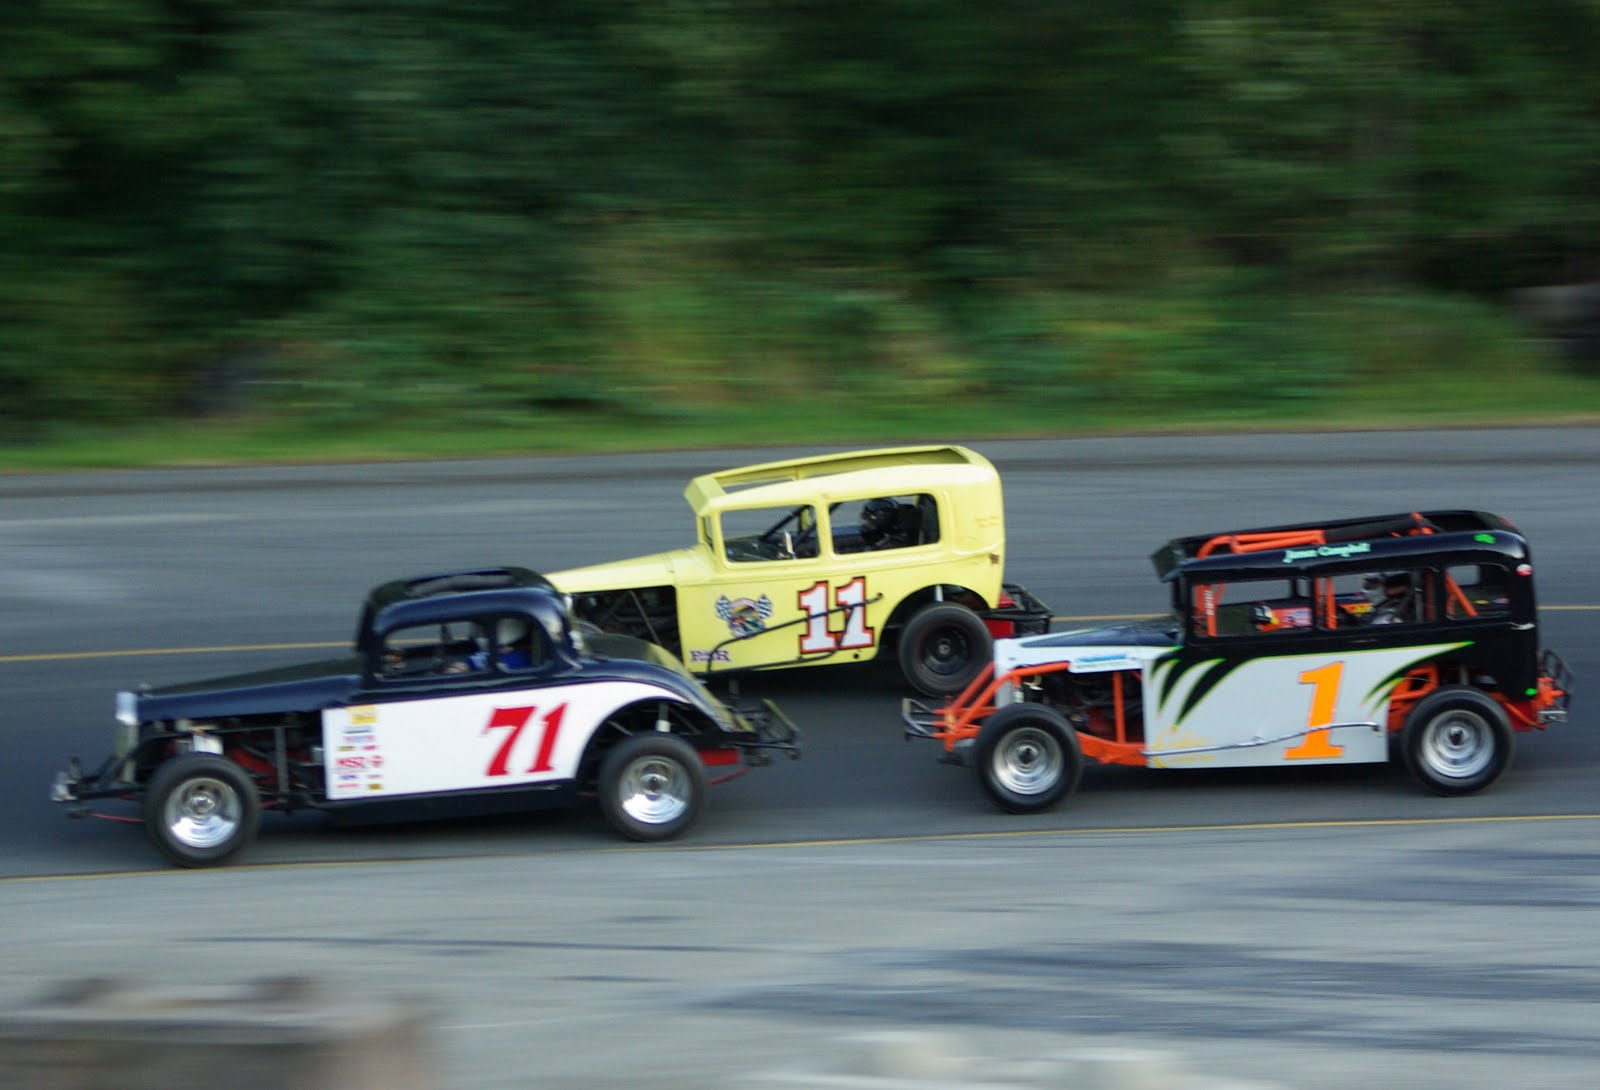 CANADA WEST RACING - We Talk Racing!: Saratoga Speedway